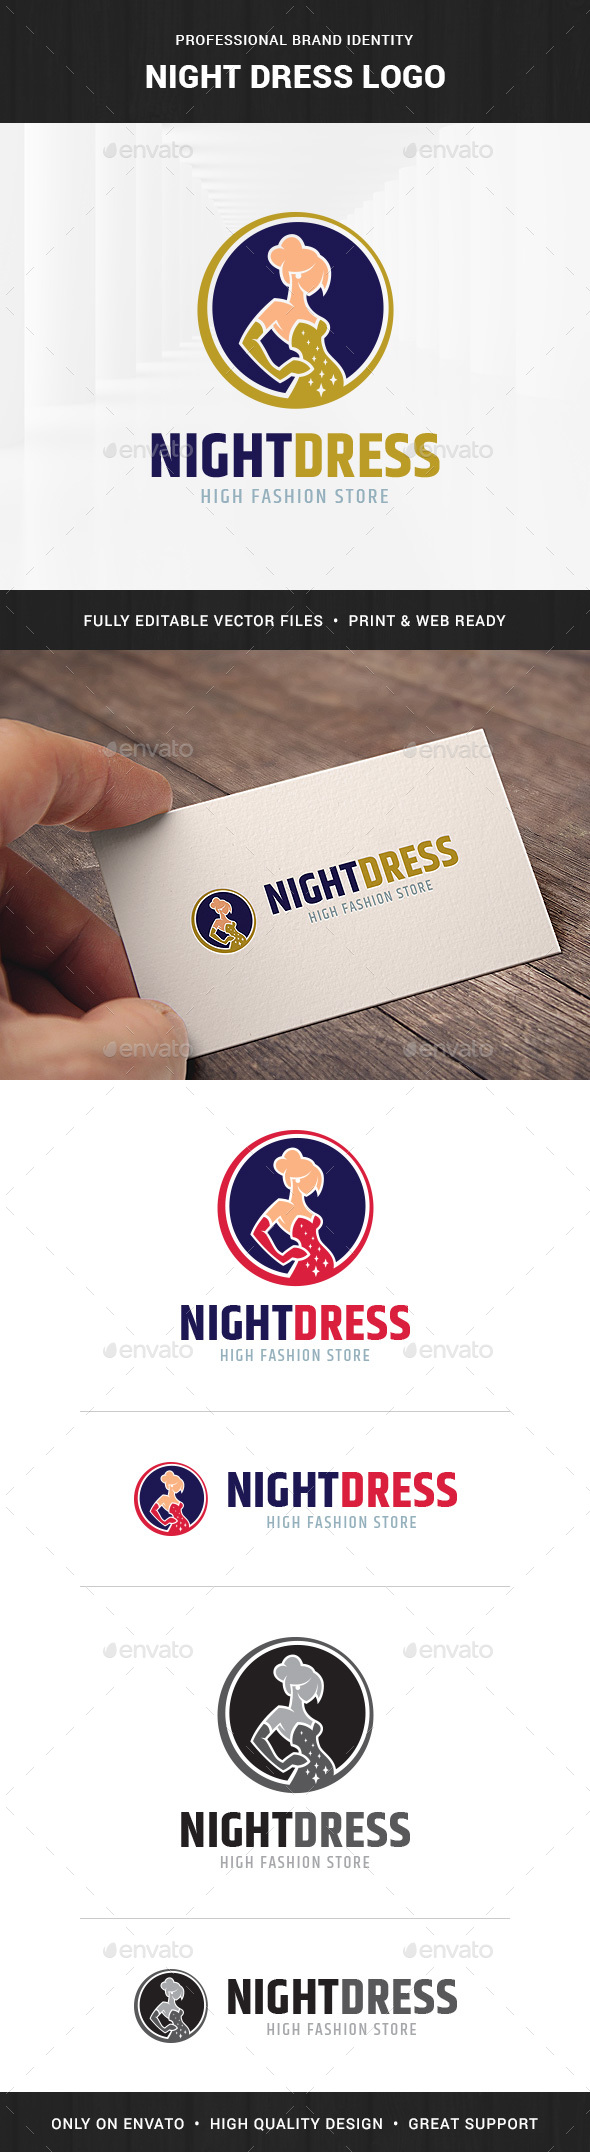 Night Dress Logo Template